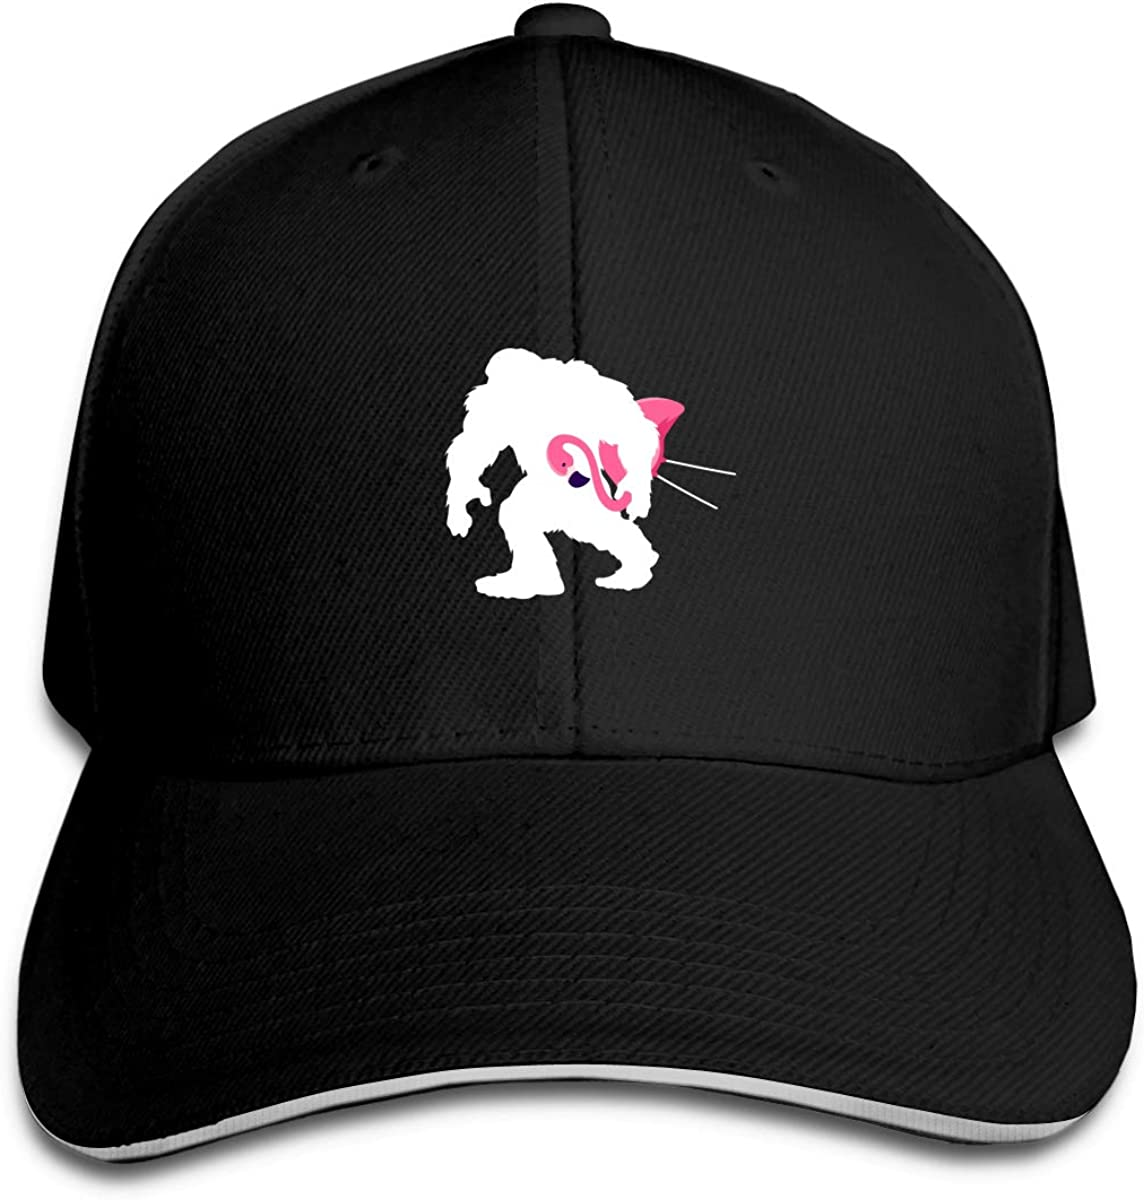 Bigfoot and Lawn Flamingo Classic Adjustable Cotton Baseball Caps Trucker Driver Hat Outdoor Cap Black